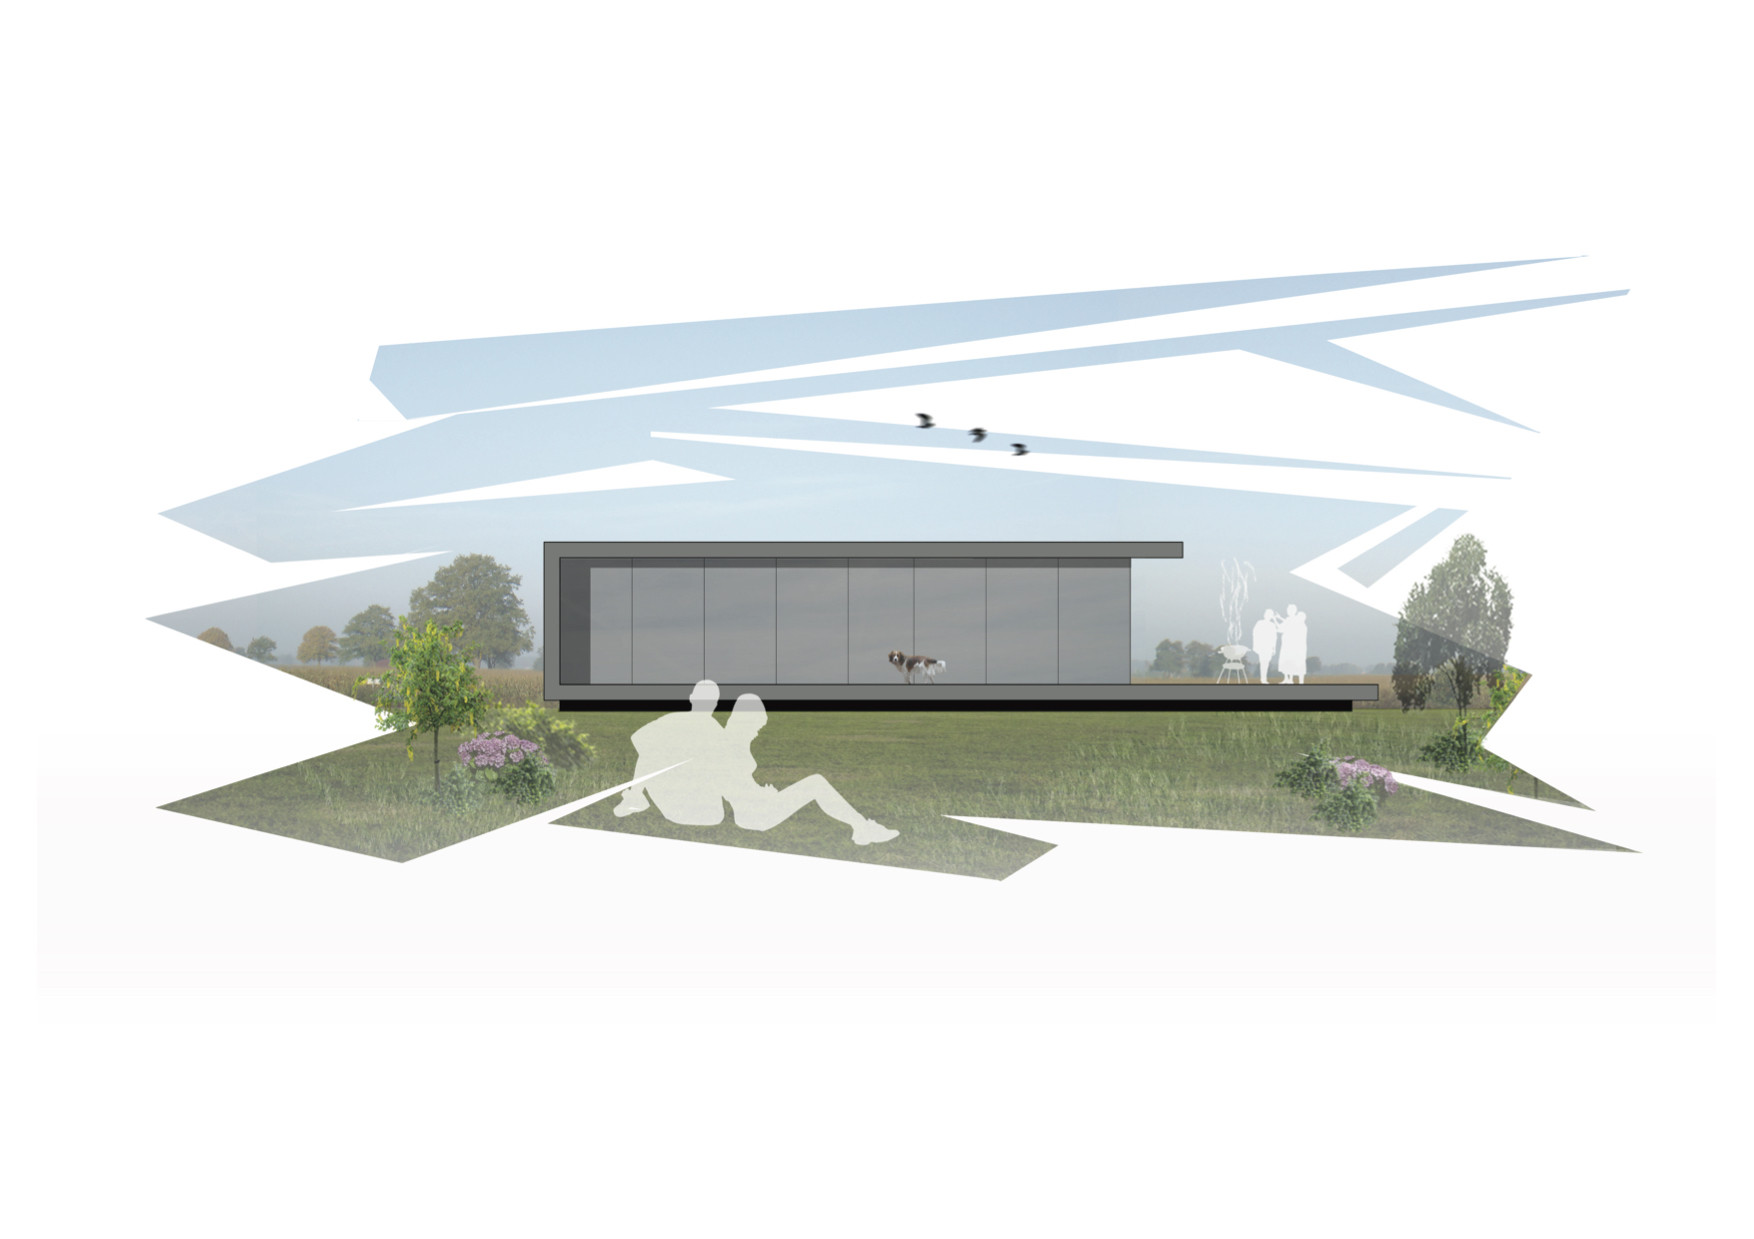 Galeria de Residência SR / Reitsema and Partners Architects - 12